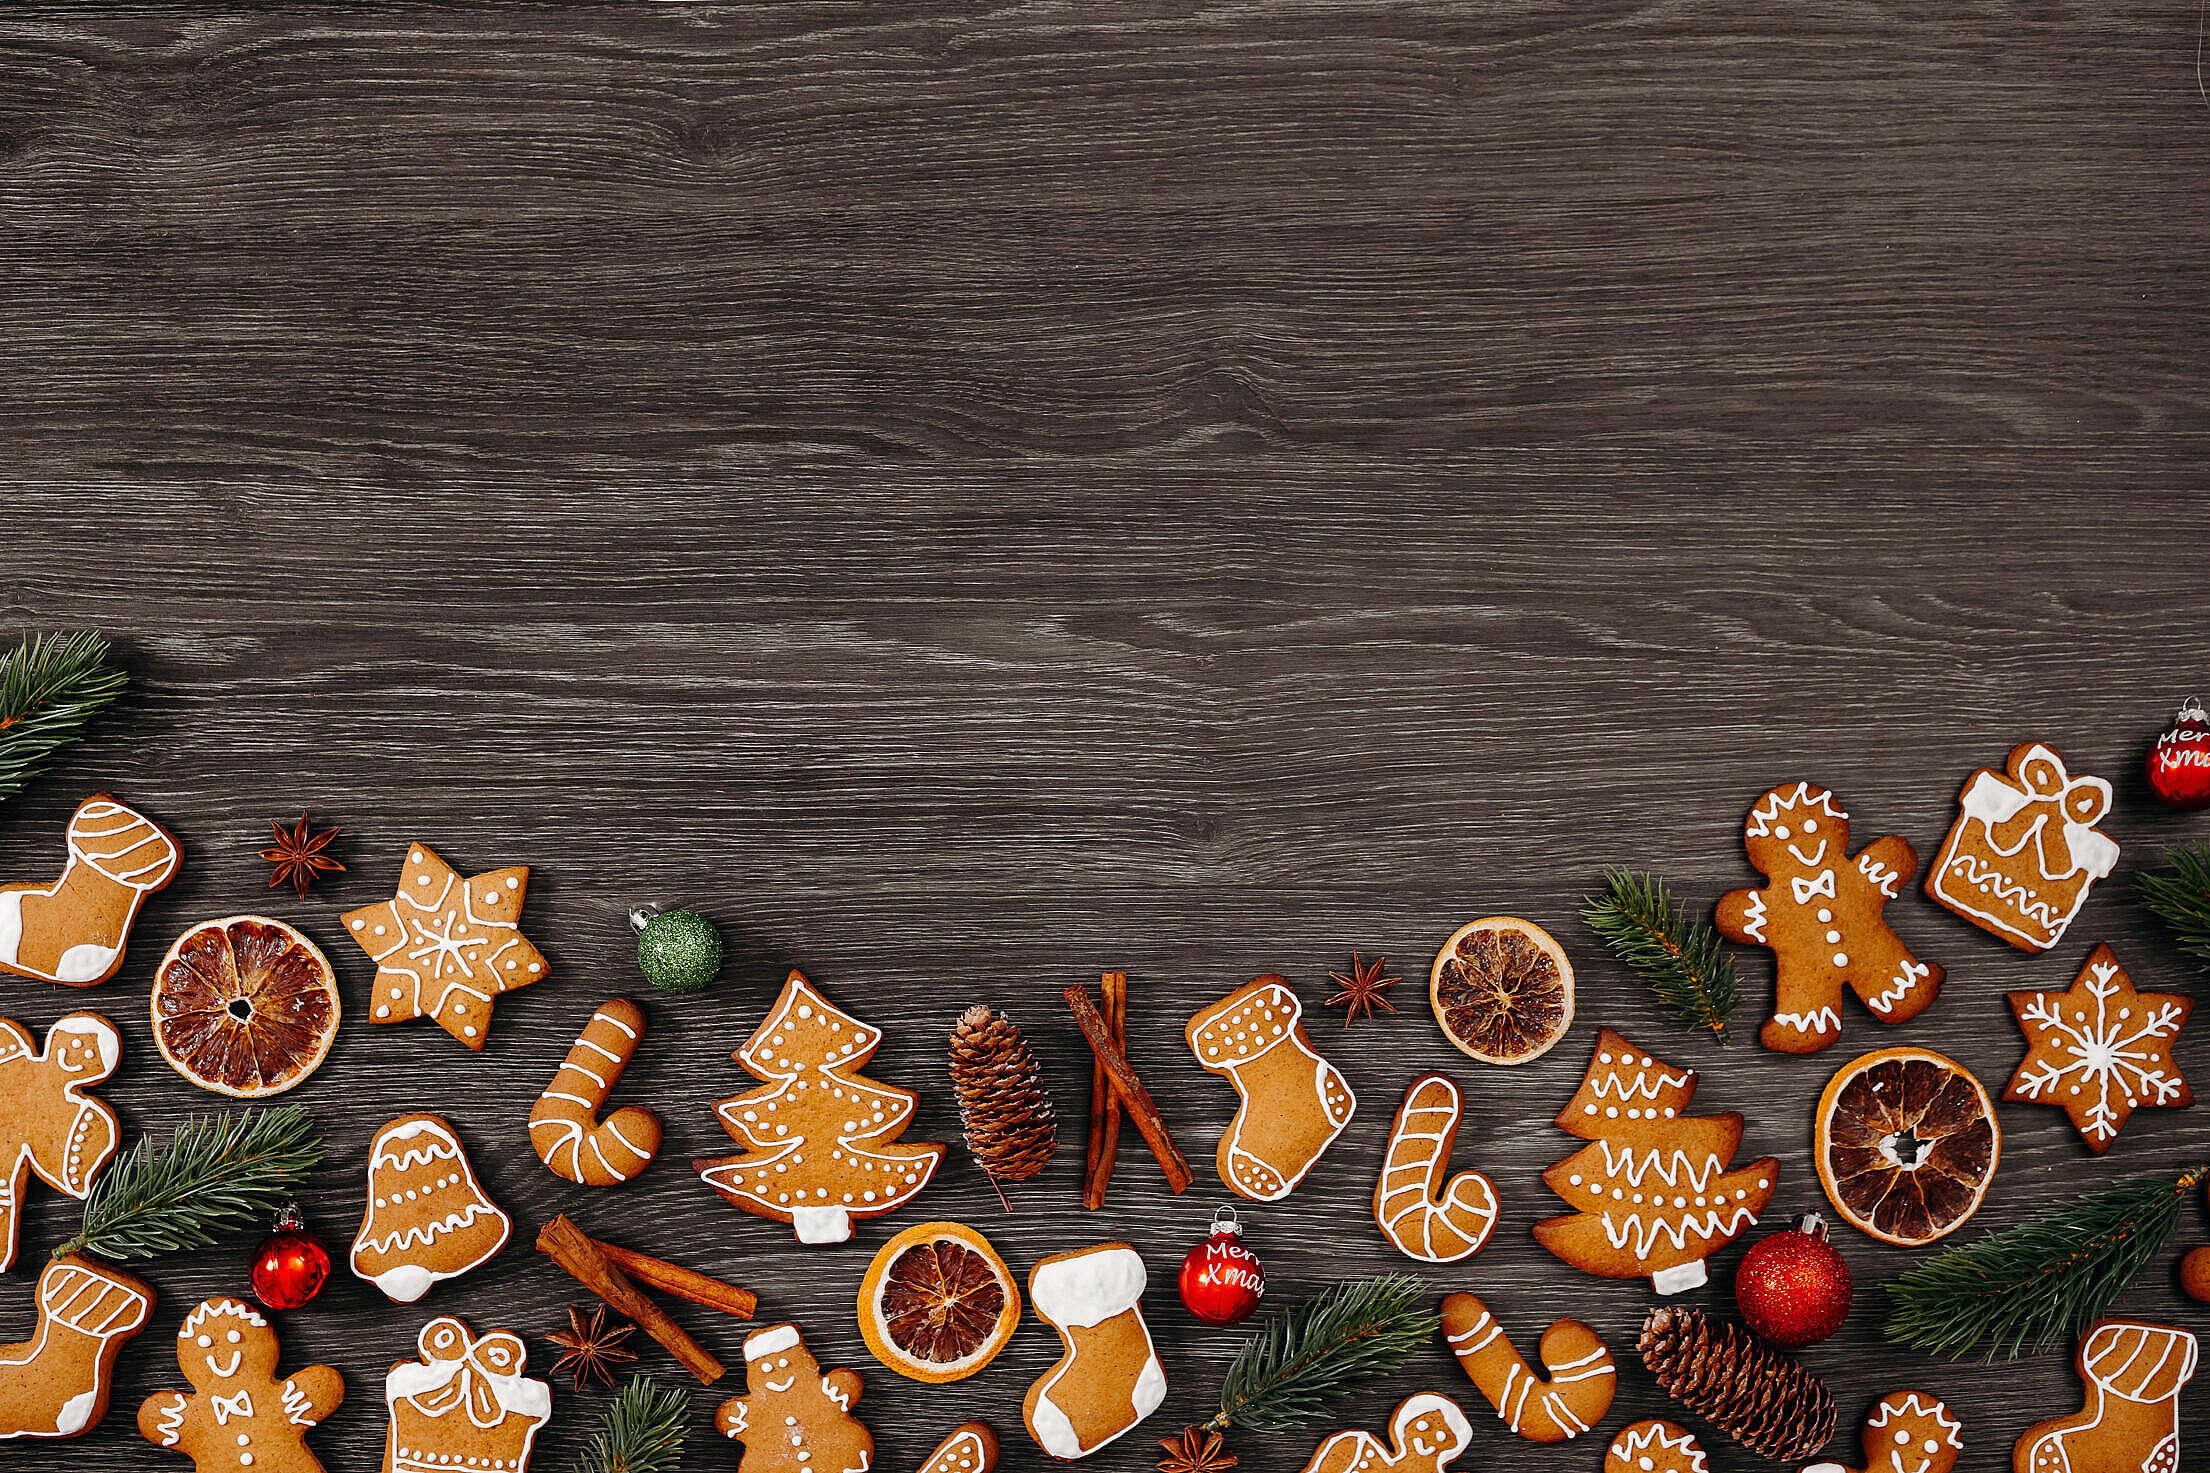 Christmas Background Free Stock Photo